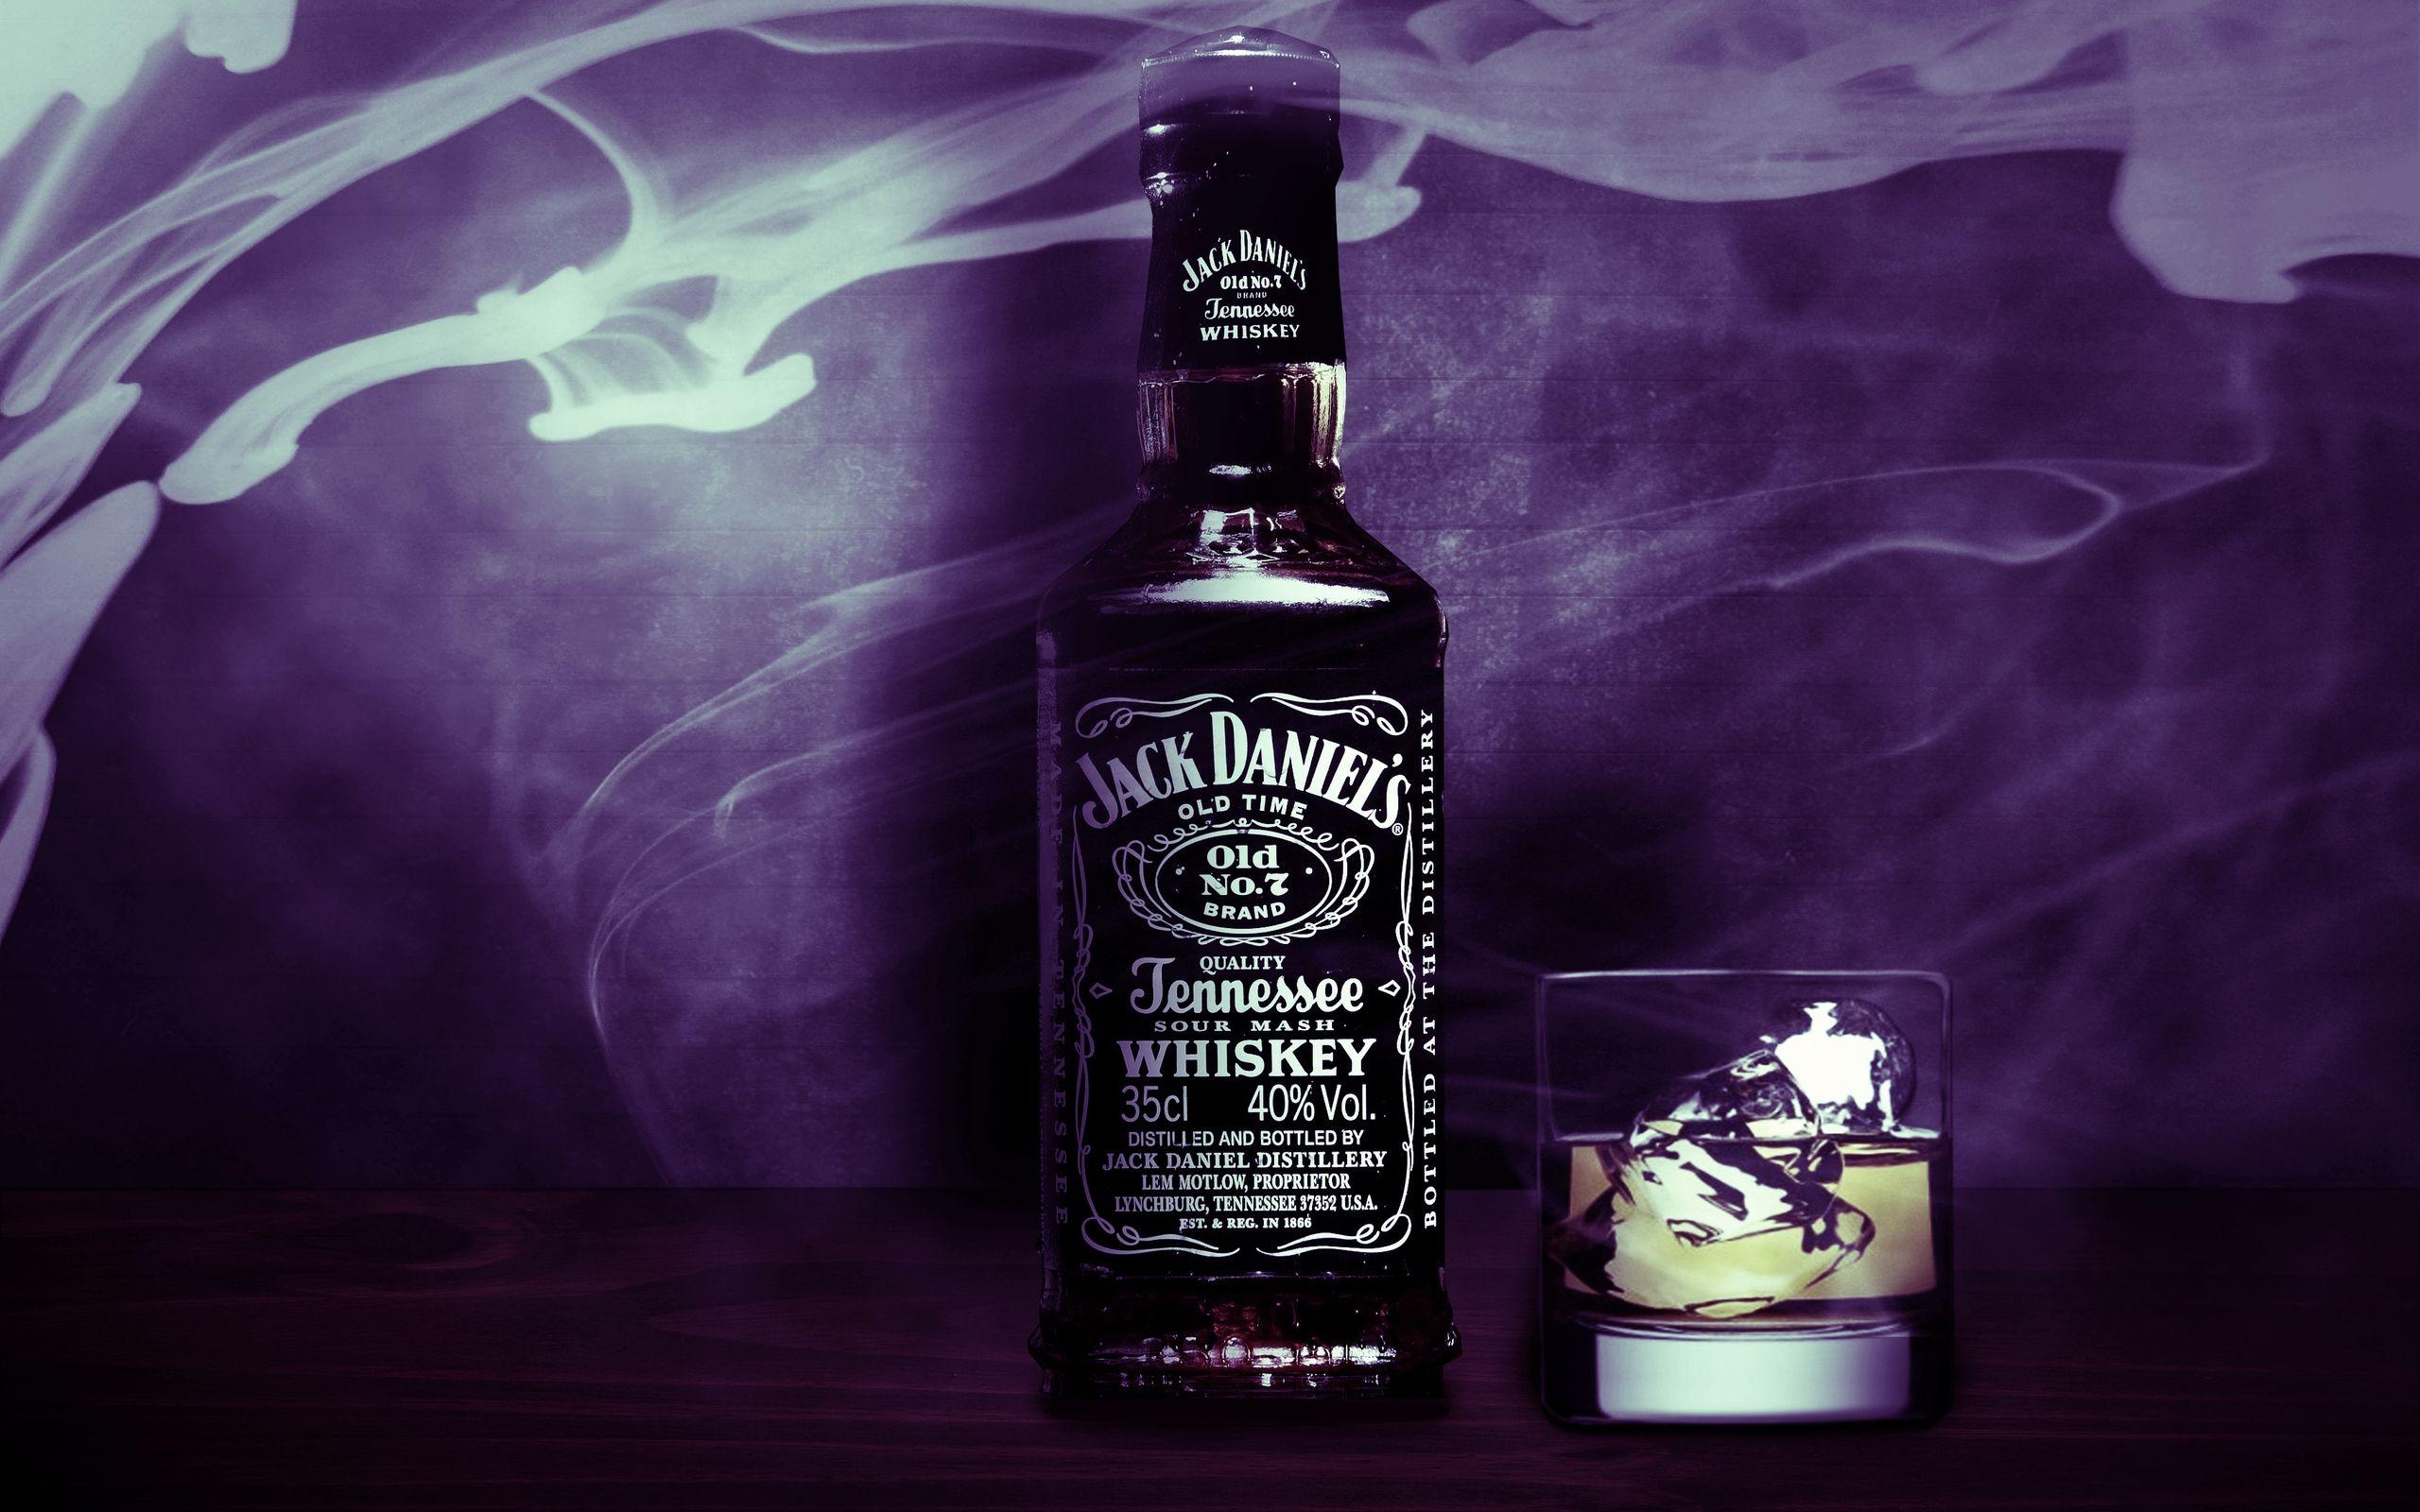 Jack Daniels Wallpaper 2560x1600 4331 Wallpaperup Jack Daniels Jack Daniels Wallpaper Whiskey